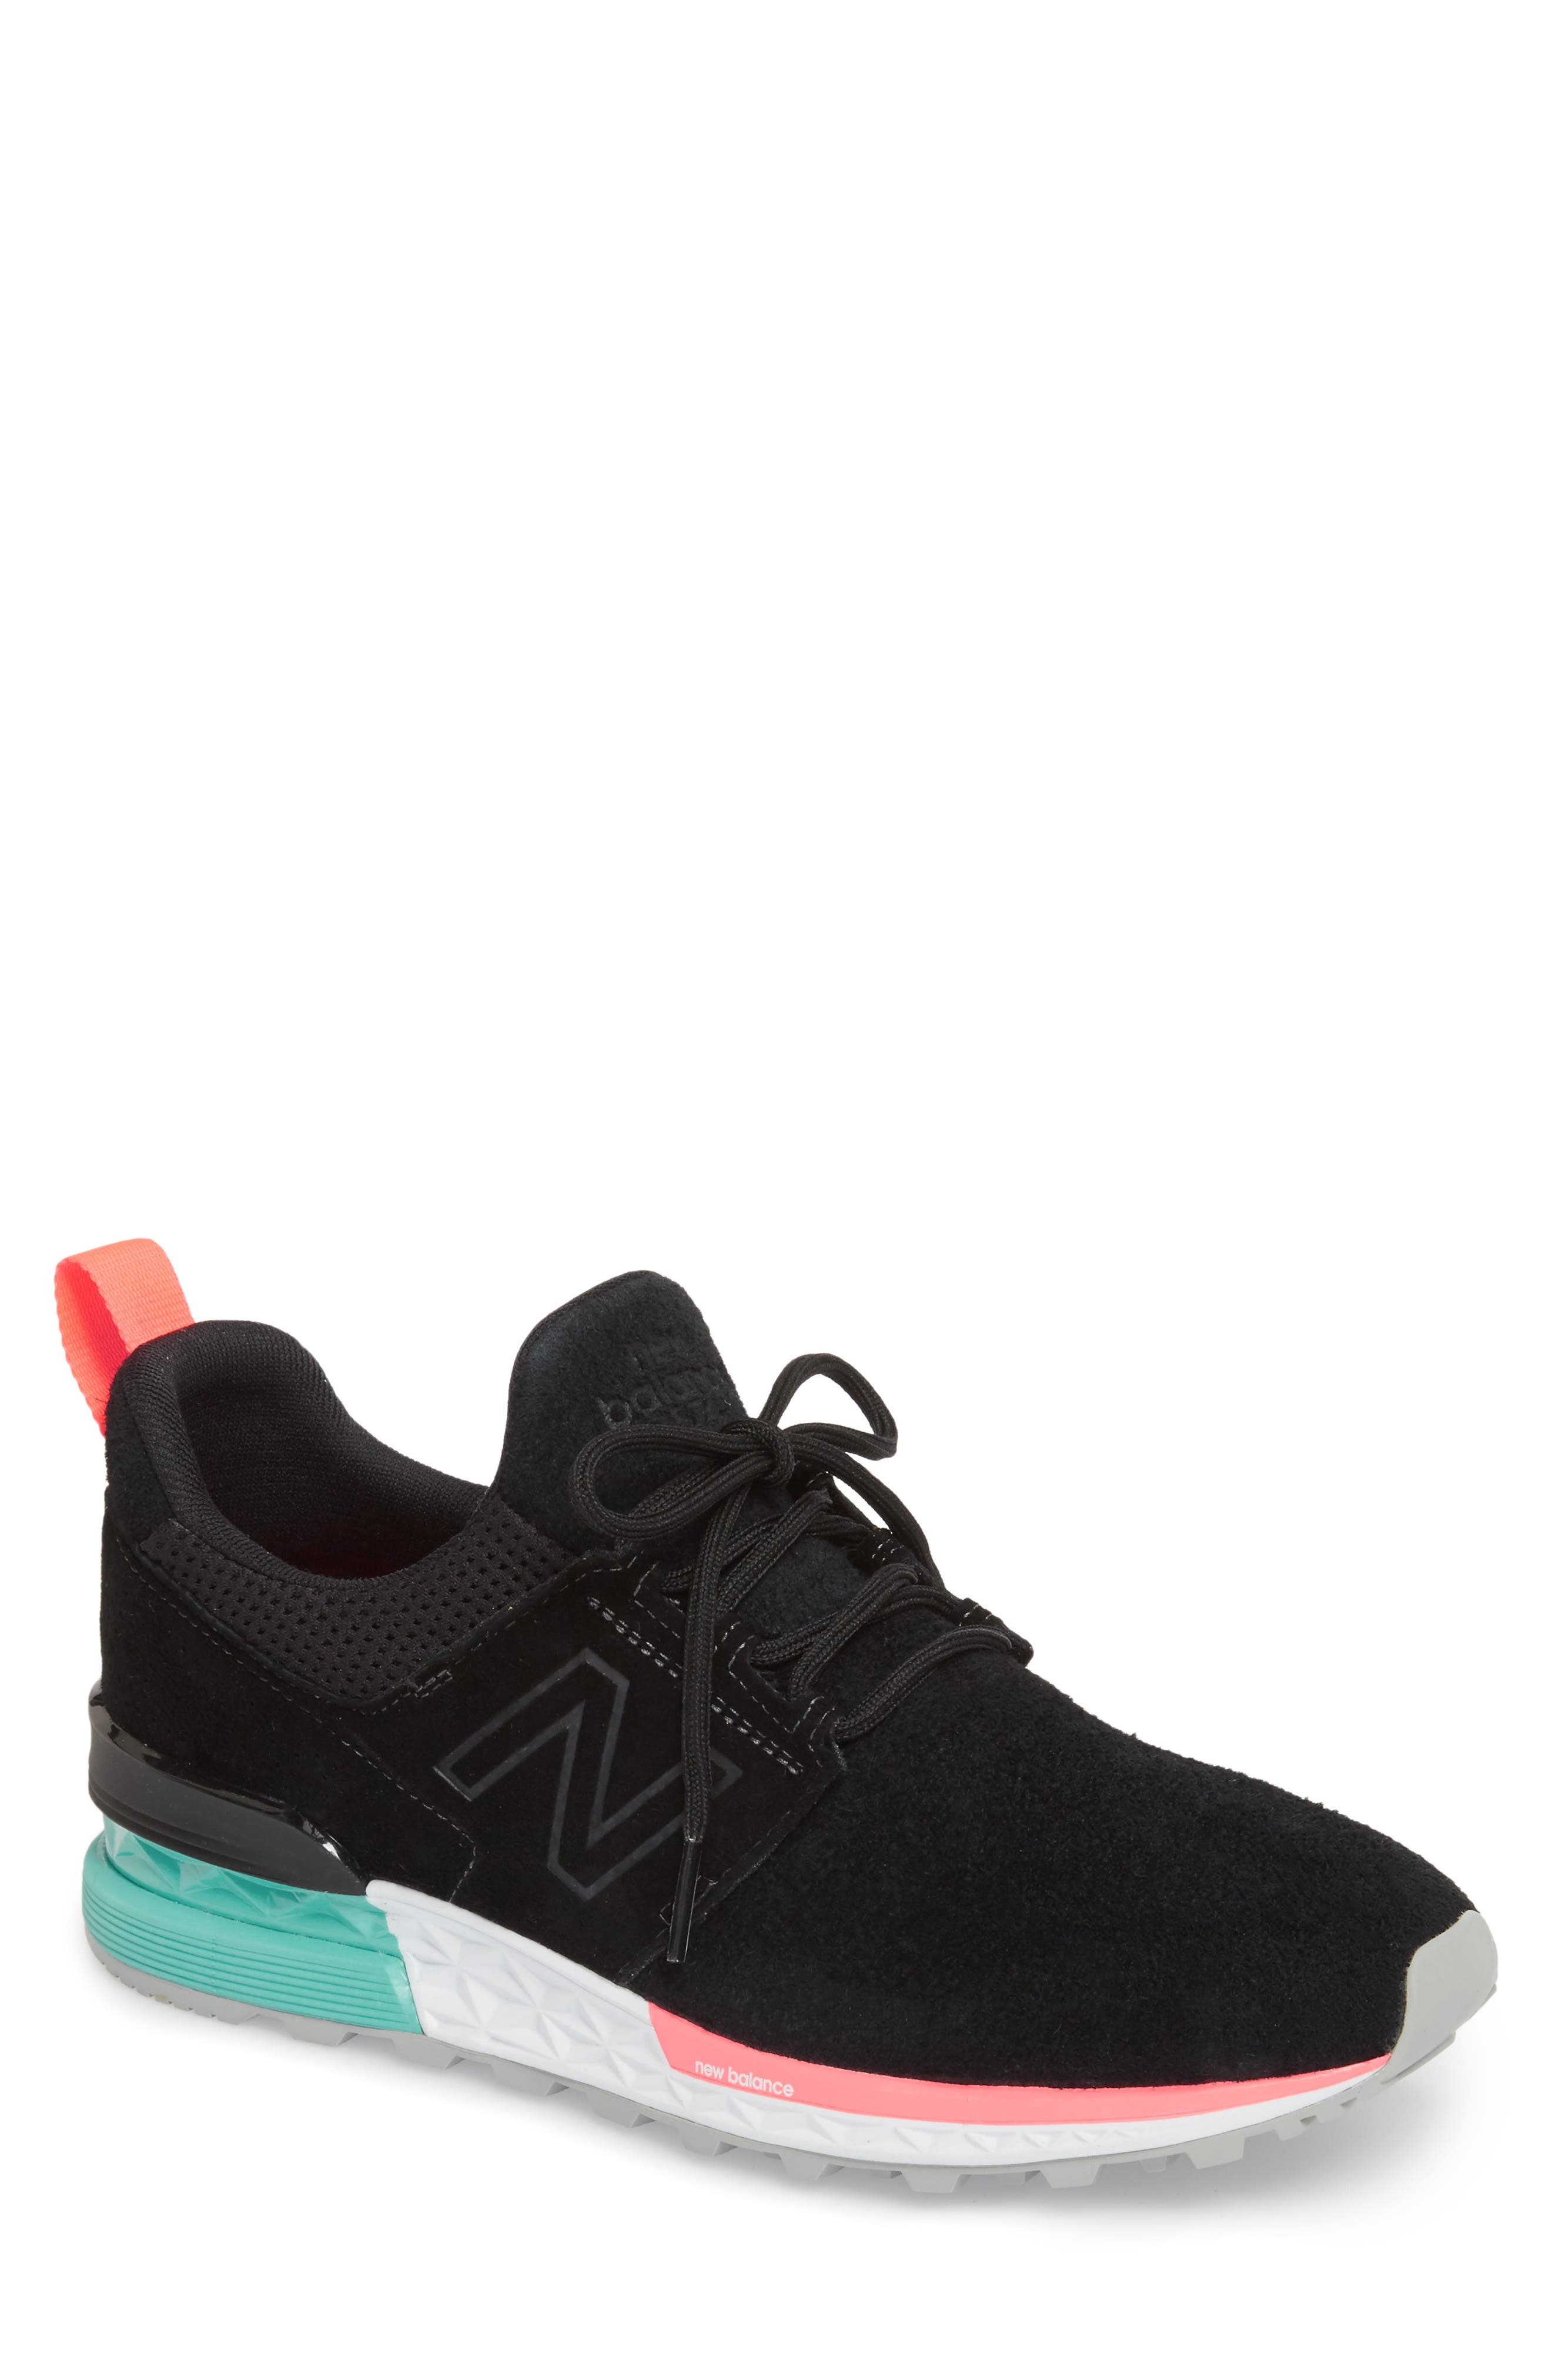 574 Sport Sneaker,                         Main,                         color, 001